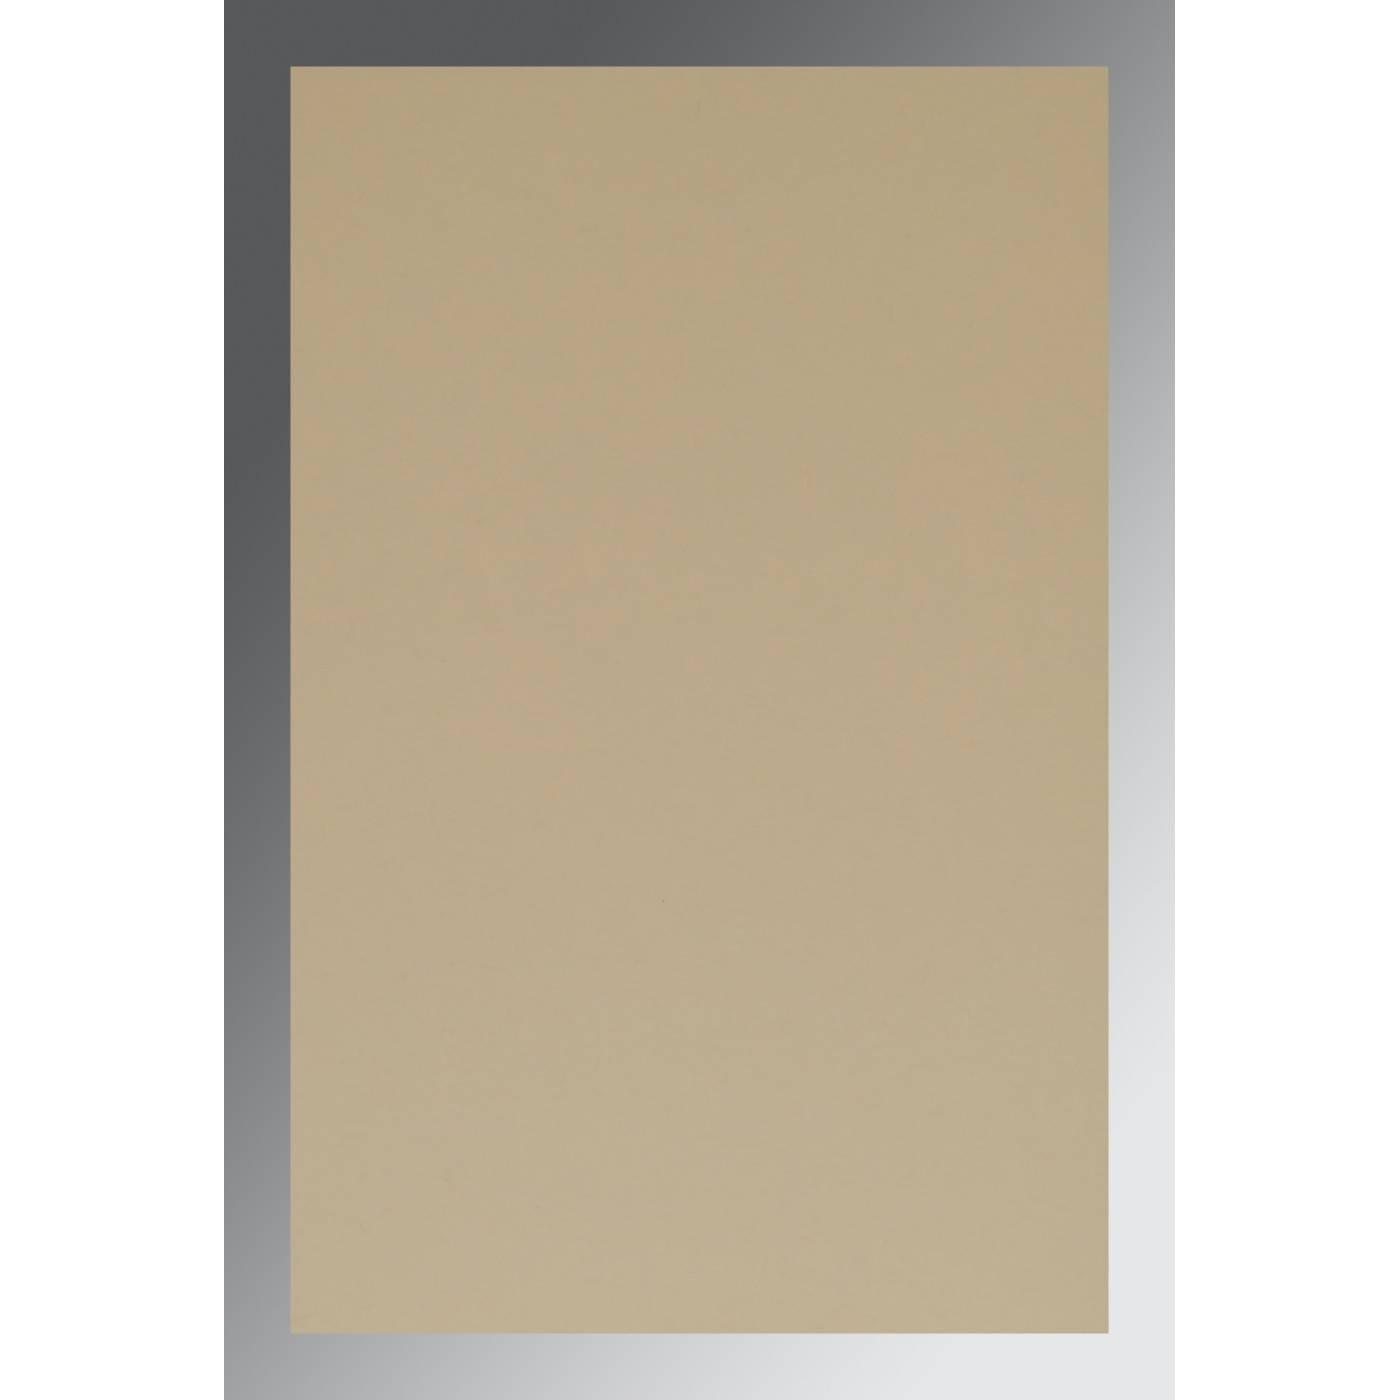 BEIGE GOLD MATTE FOIL STAMPED WEDDING CARD : CG-1407 - IndianWeddingCards